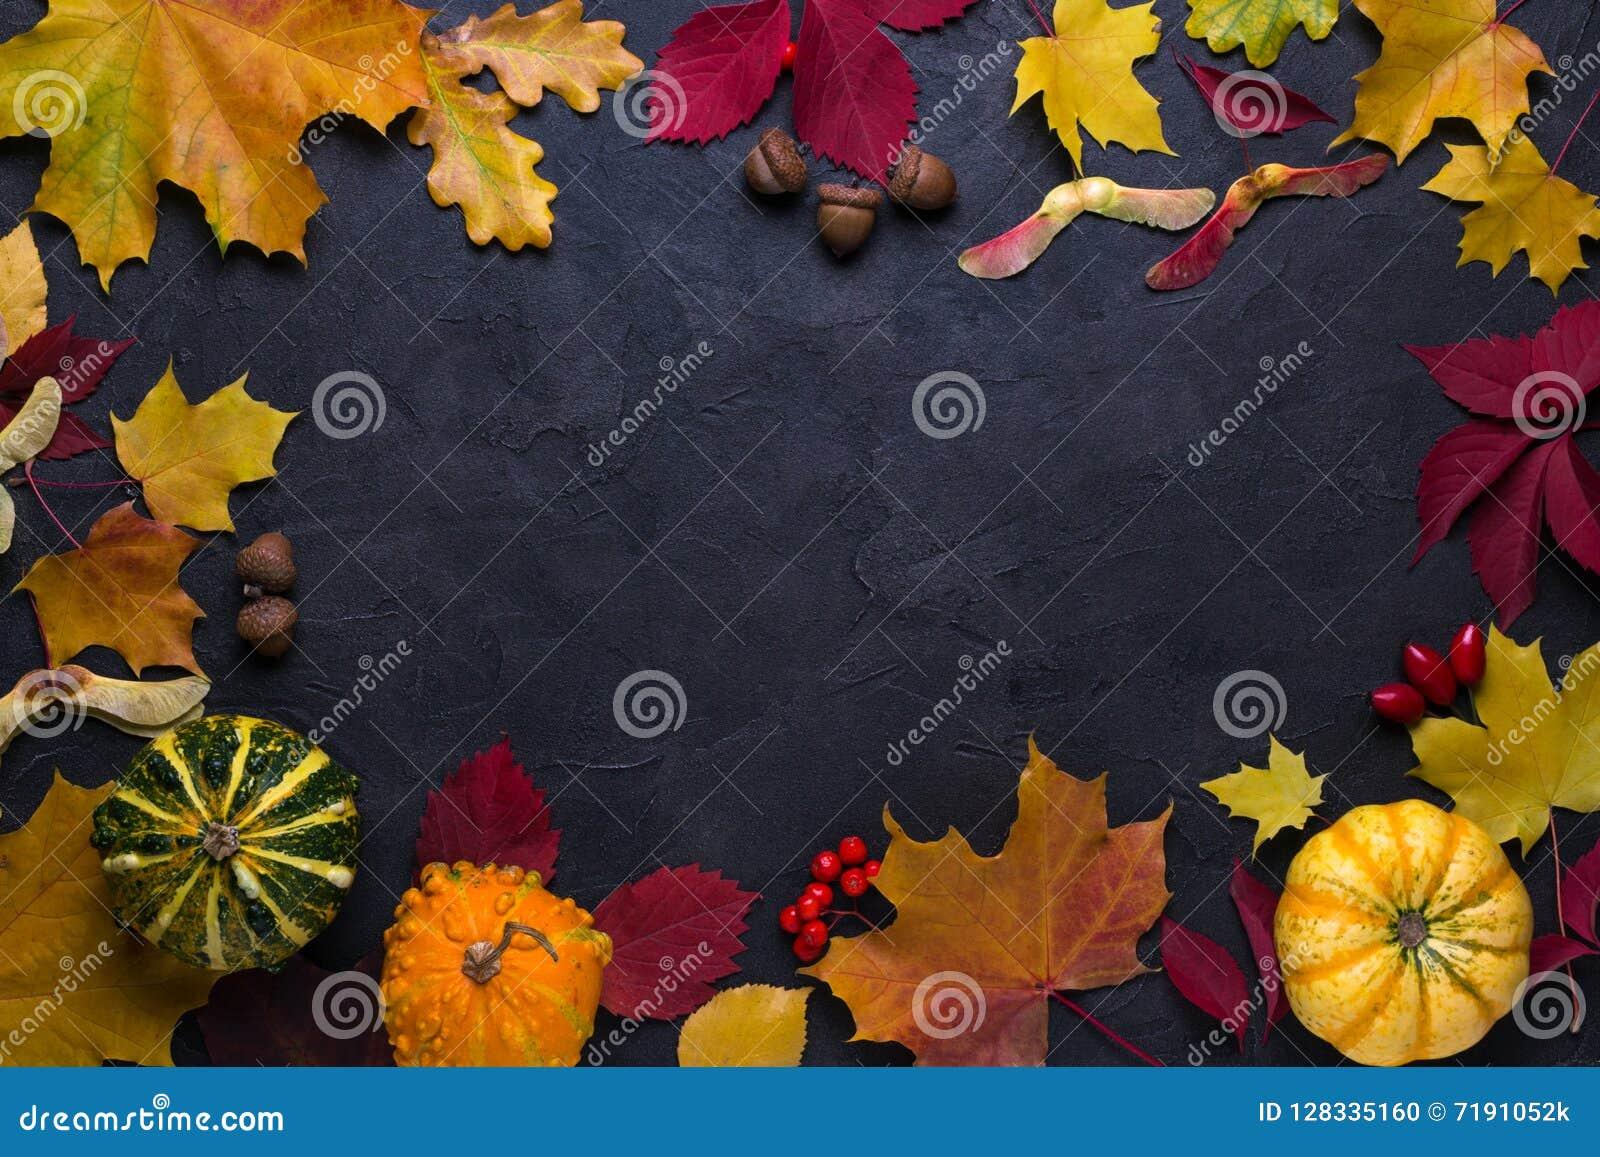 Frame with autumn maple leaves. Nature fall template for design, menu, postcard, banner, ticket, leaflet, poster. On dark backgr